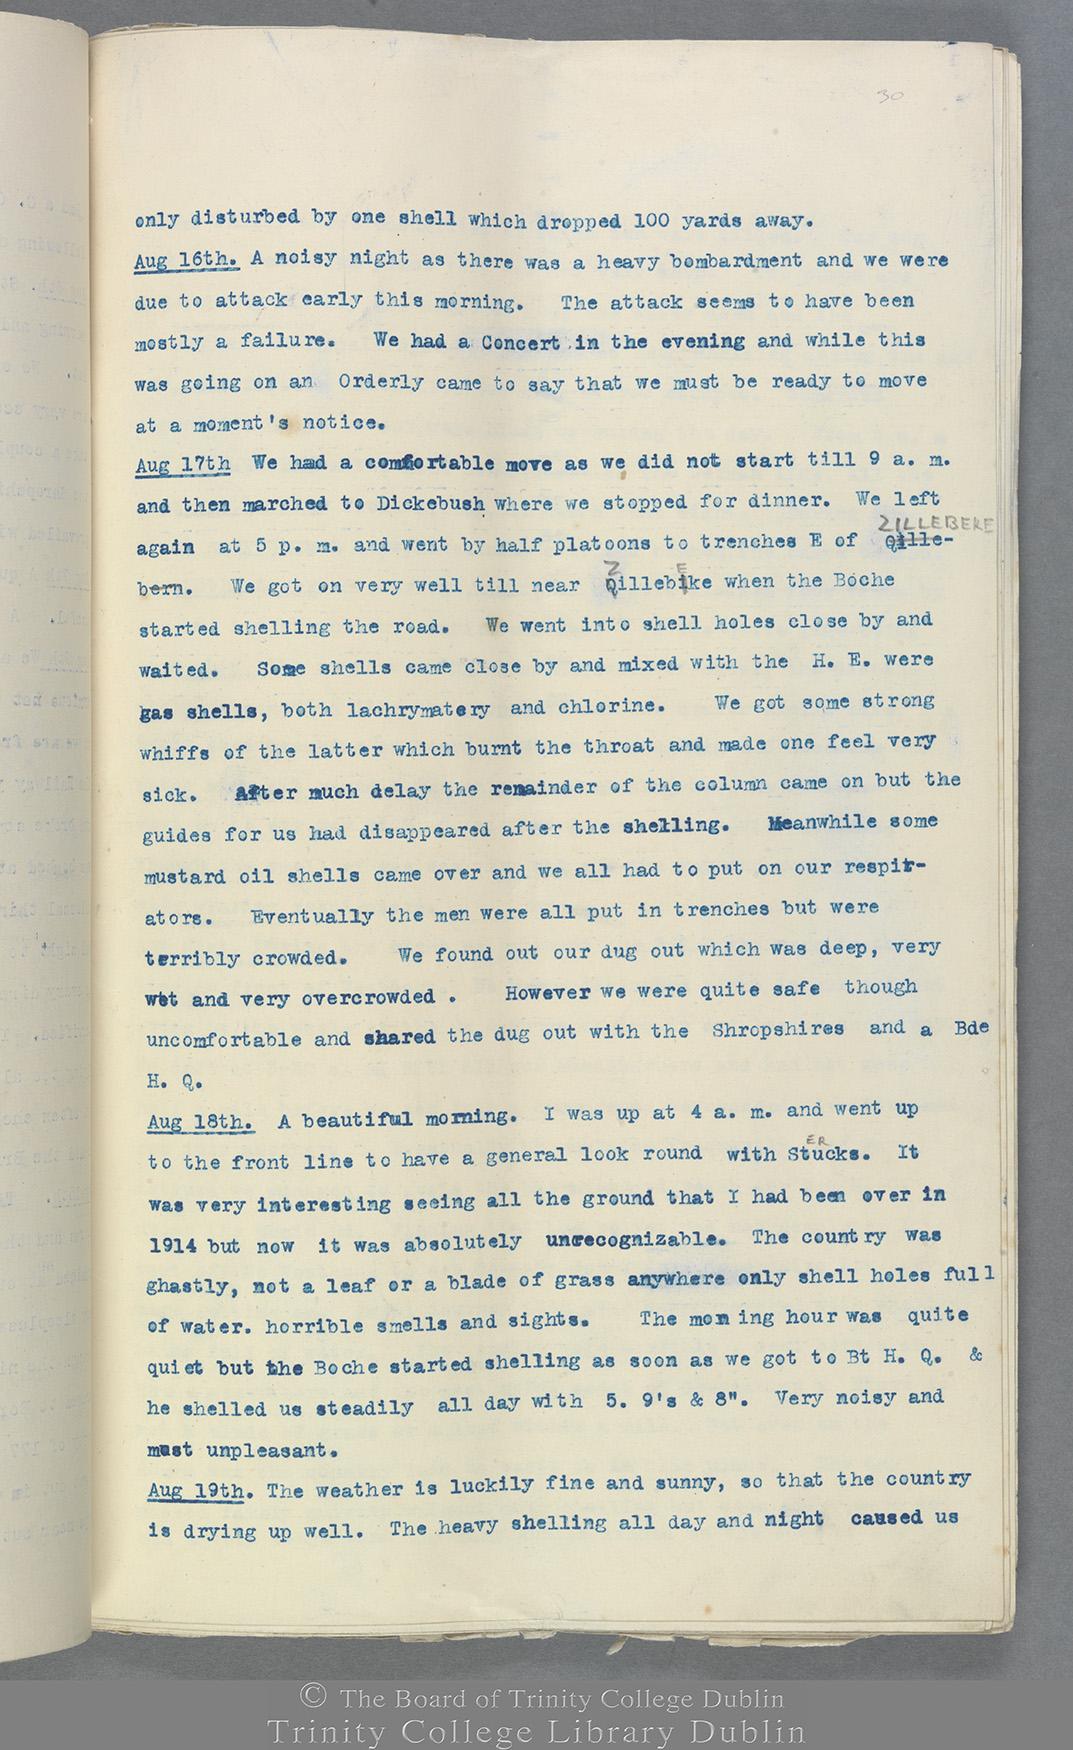 TCD MS 10822 folio 30 recto